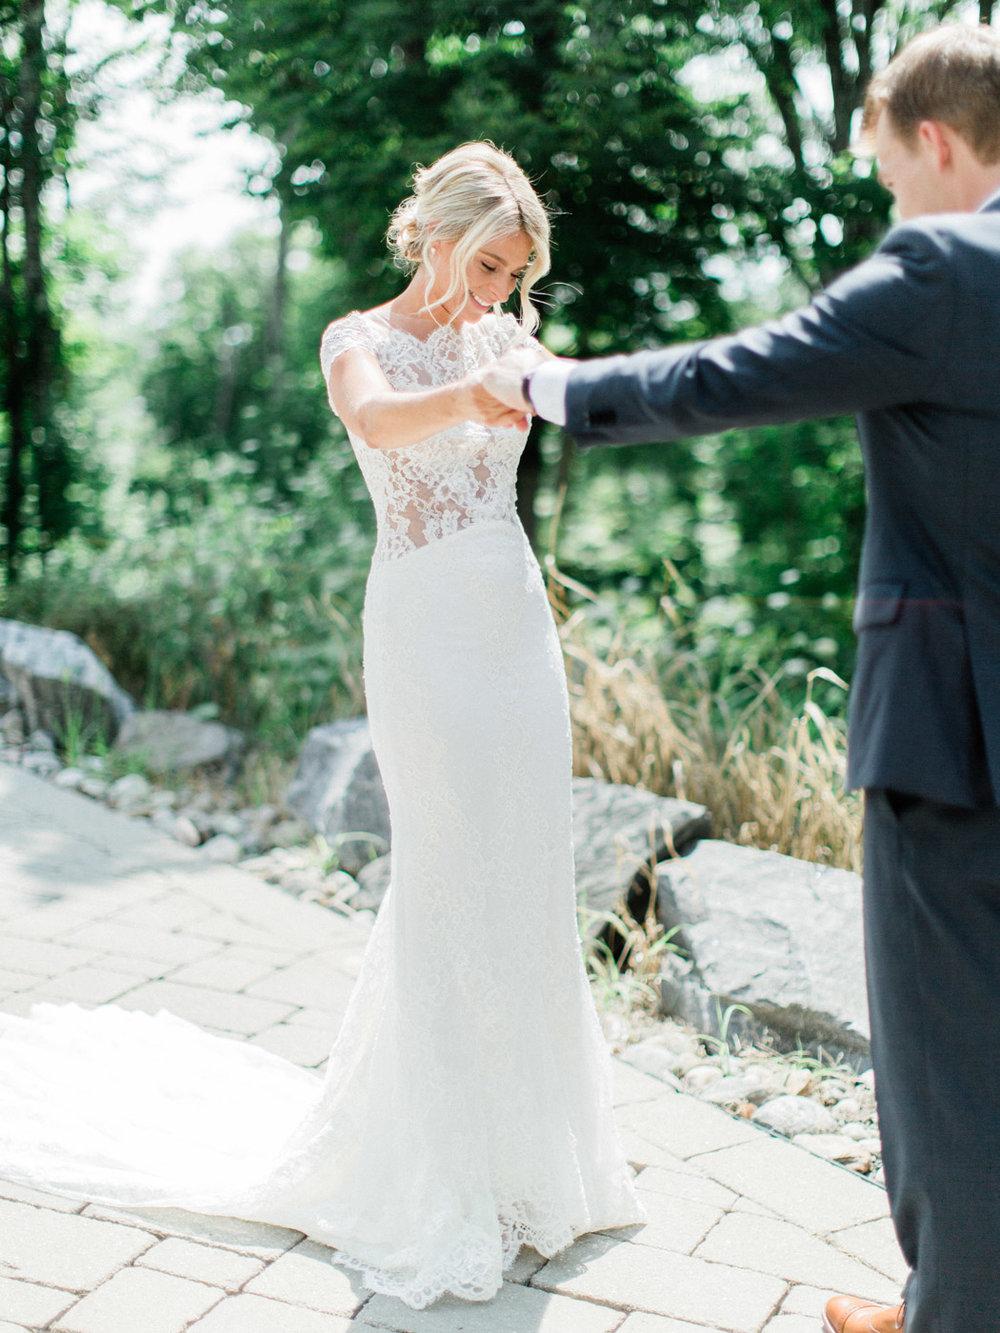 Toronto-Muskoka-wedding-photographer-summery-fun-documentary-the-marriott-rosseau34.jpg